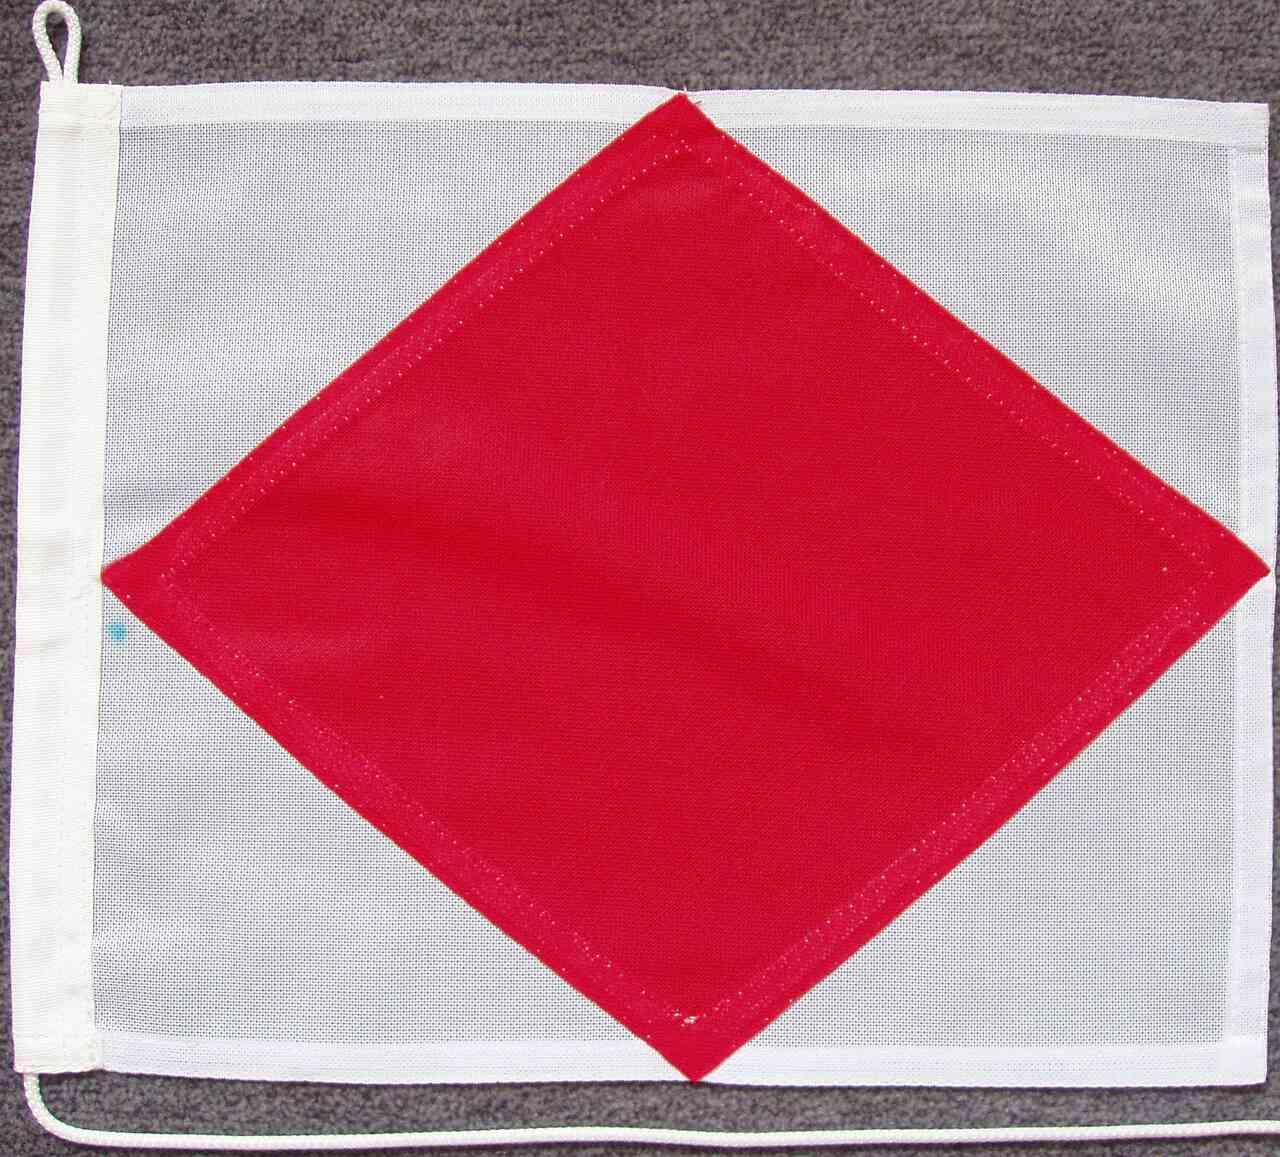 Signalflagge F - Foxtrot